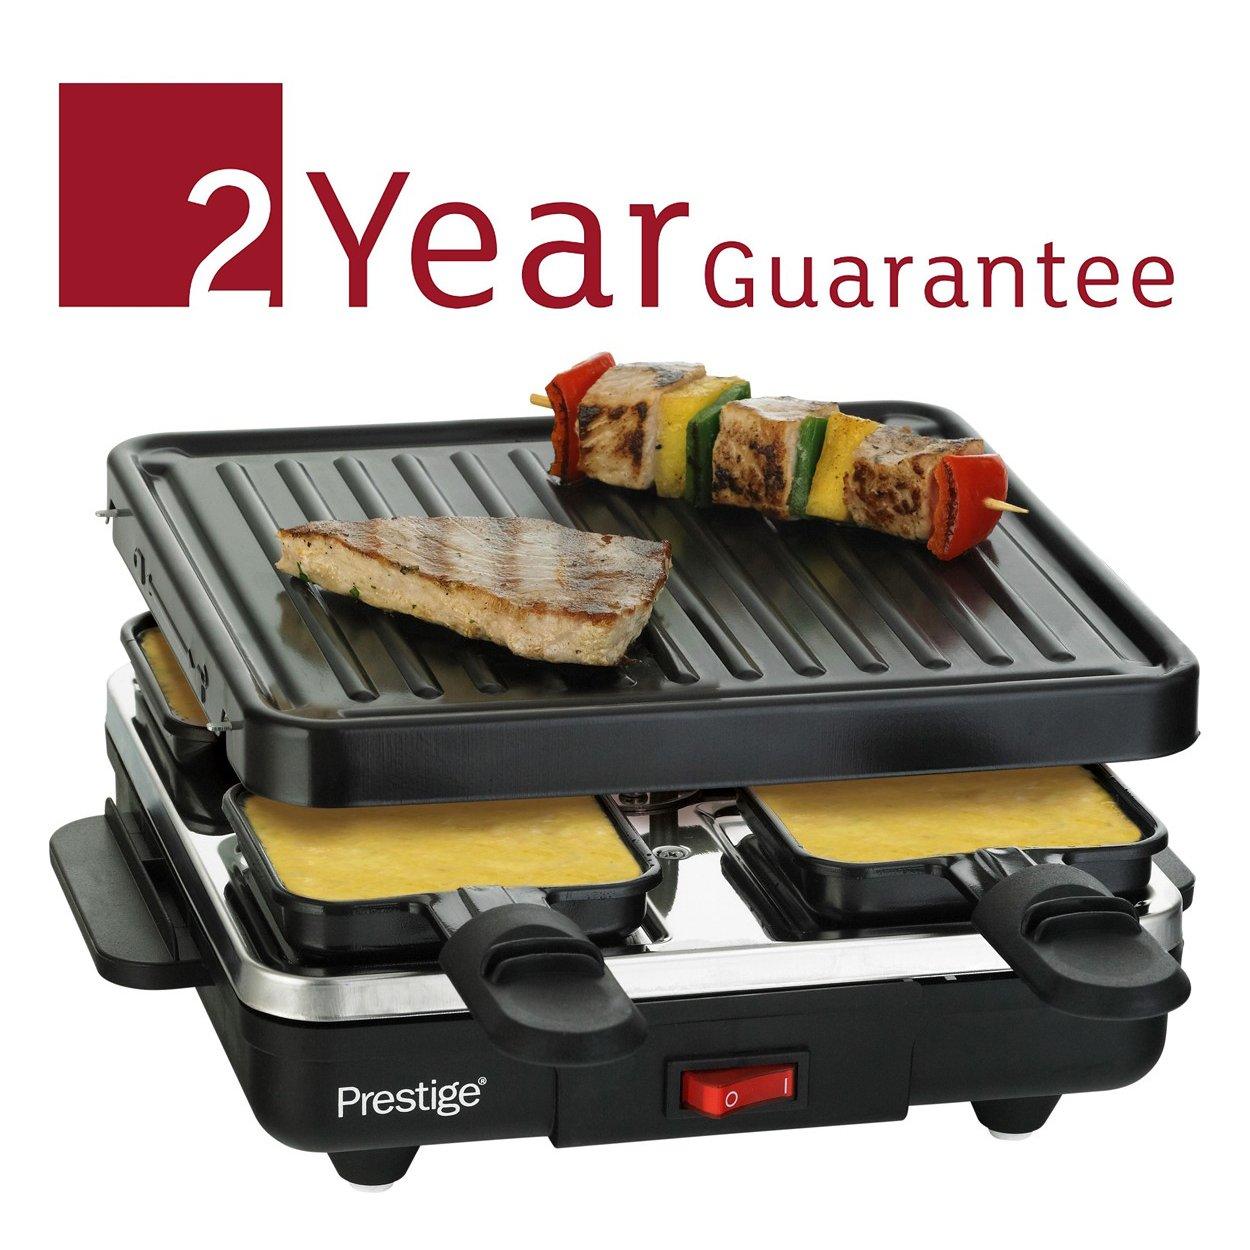 Prestige 59908 Raclette Non-Stick Grill and 4 Mini Pans